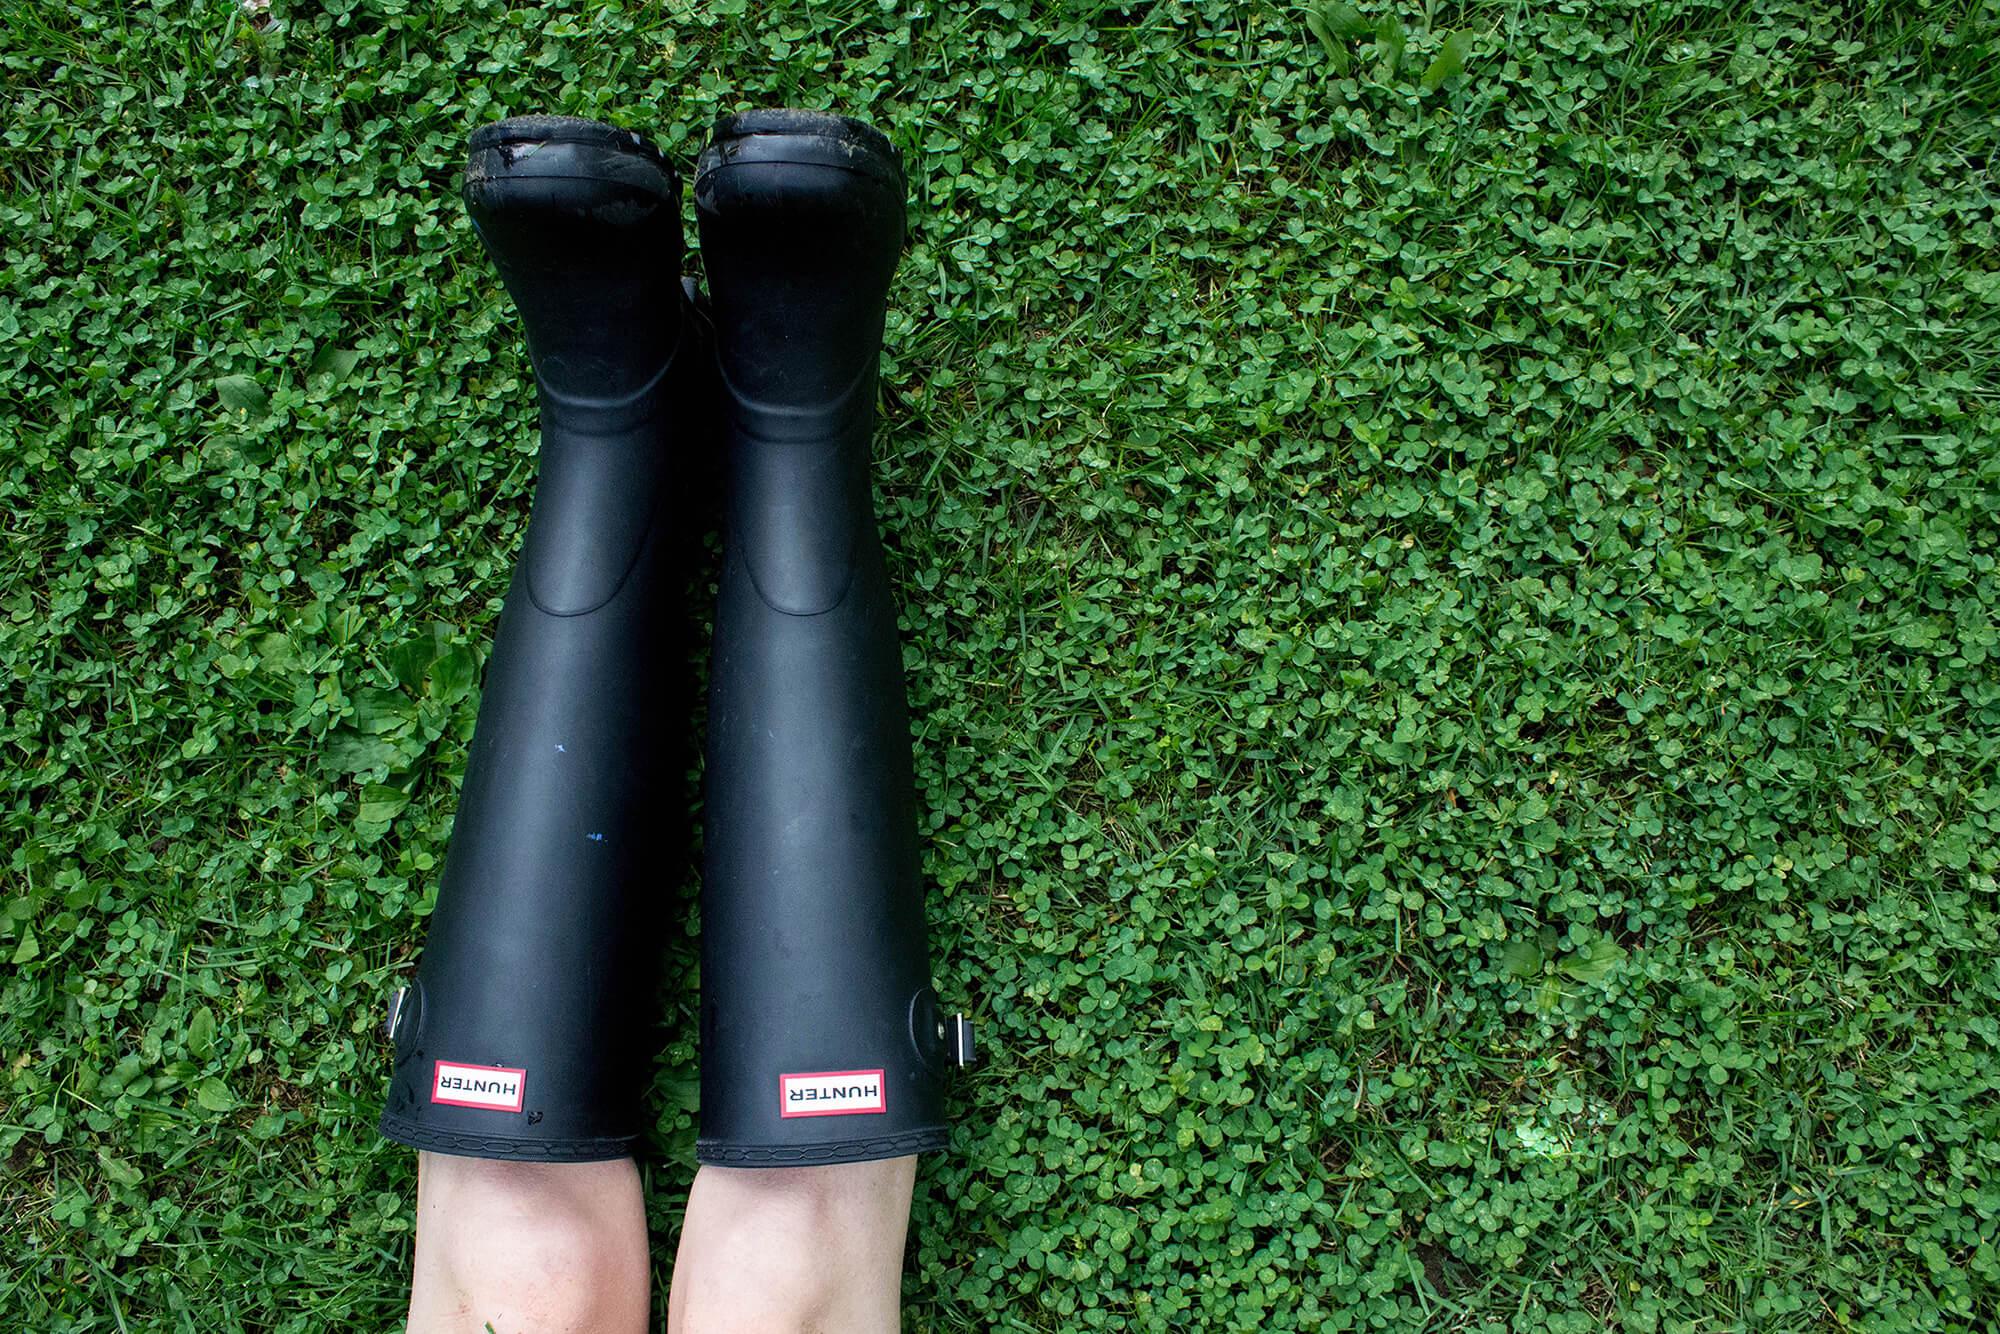 Nogi w czarnych gumowcach Hunters na trawie